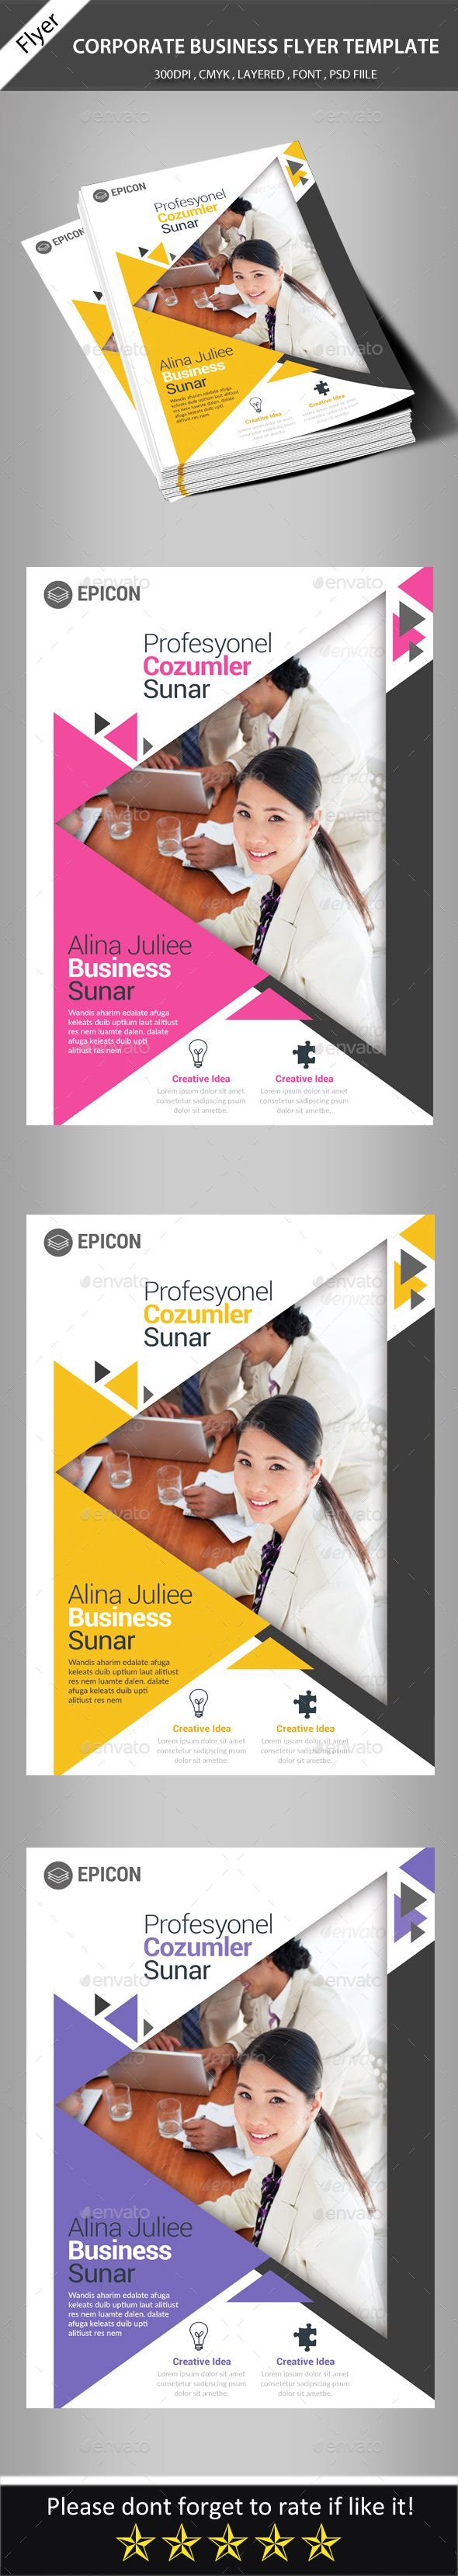 Corporate Business Flyer Template | Arte gráfico, Diseño editorial y ...